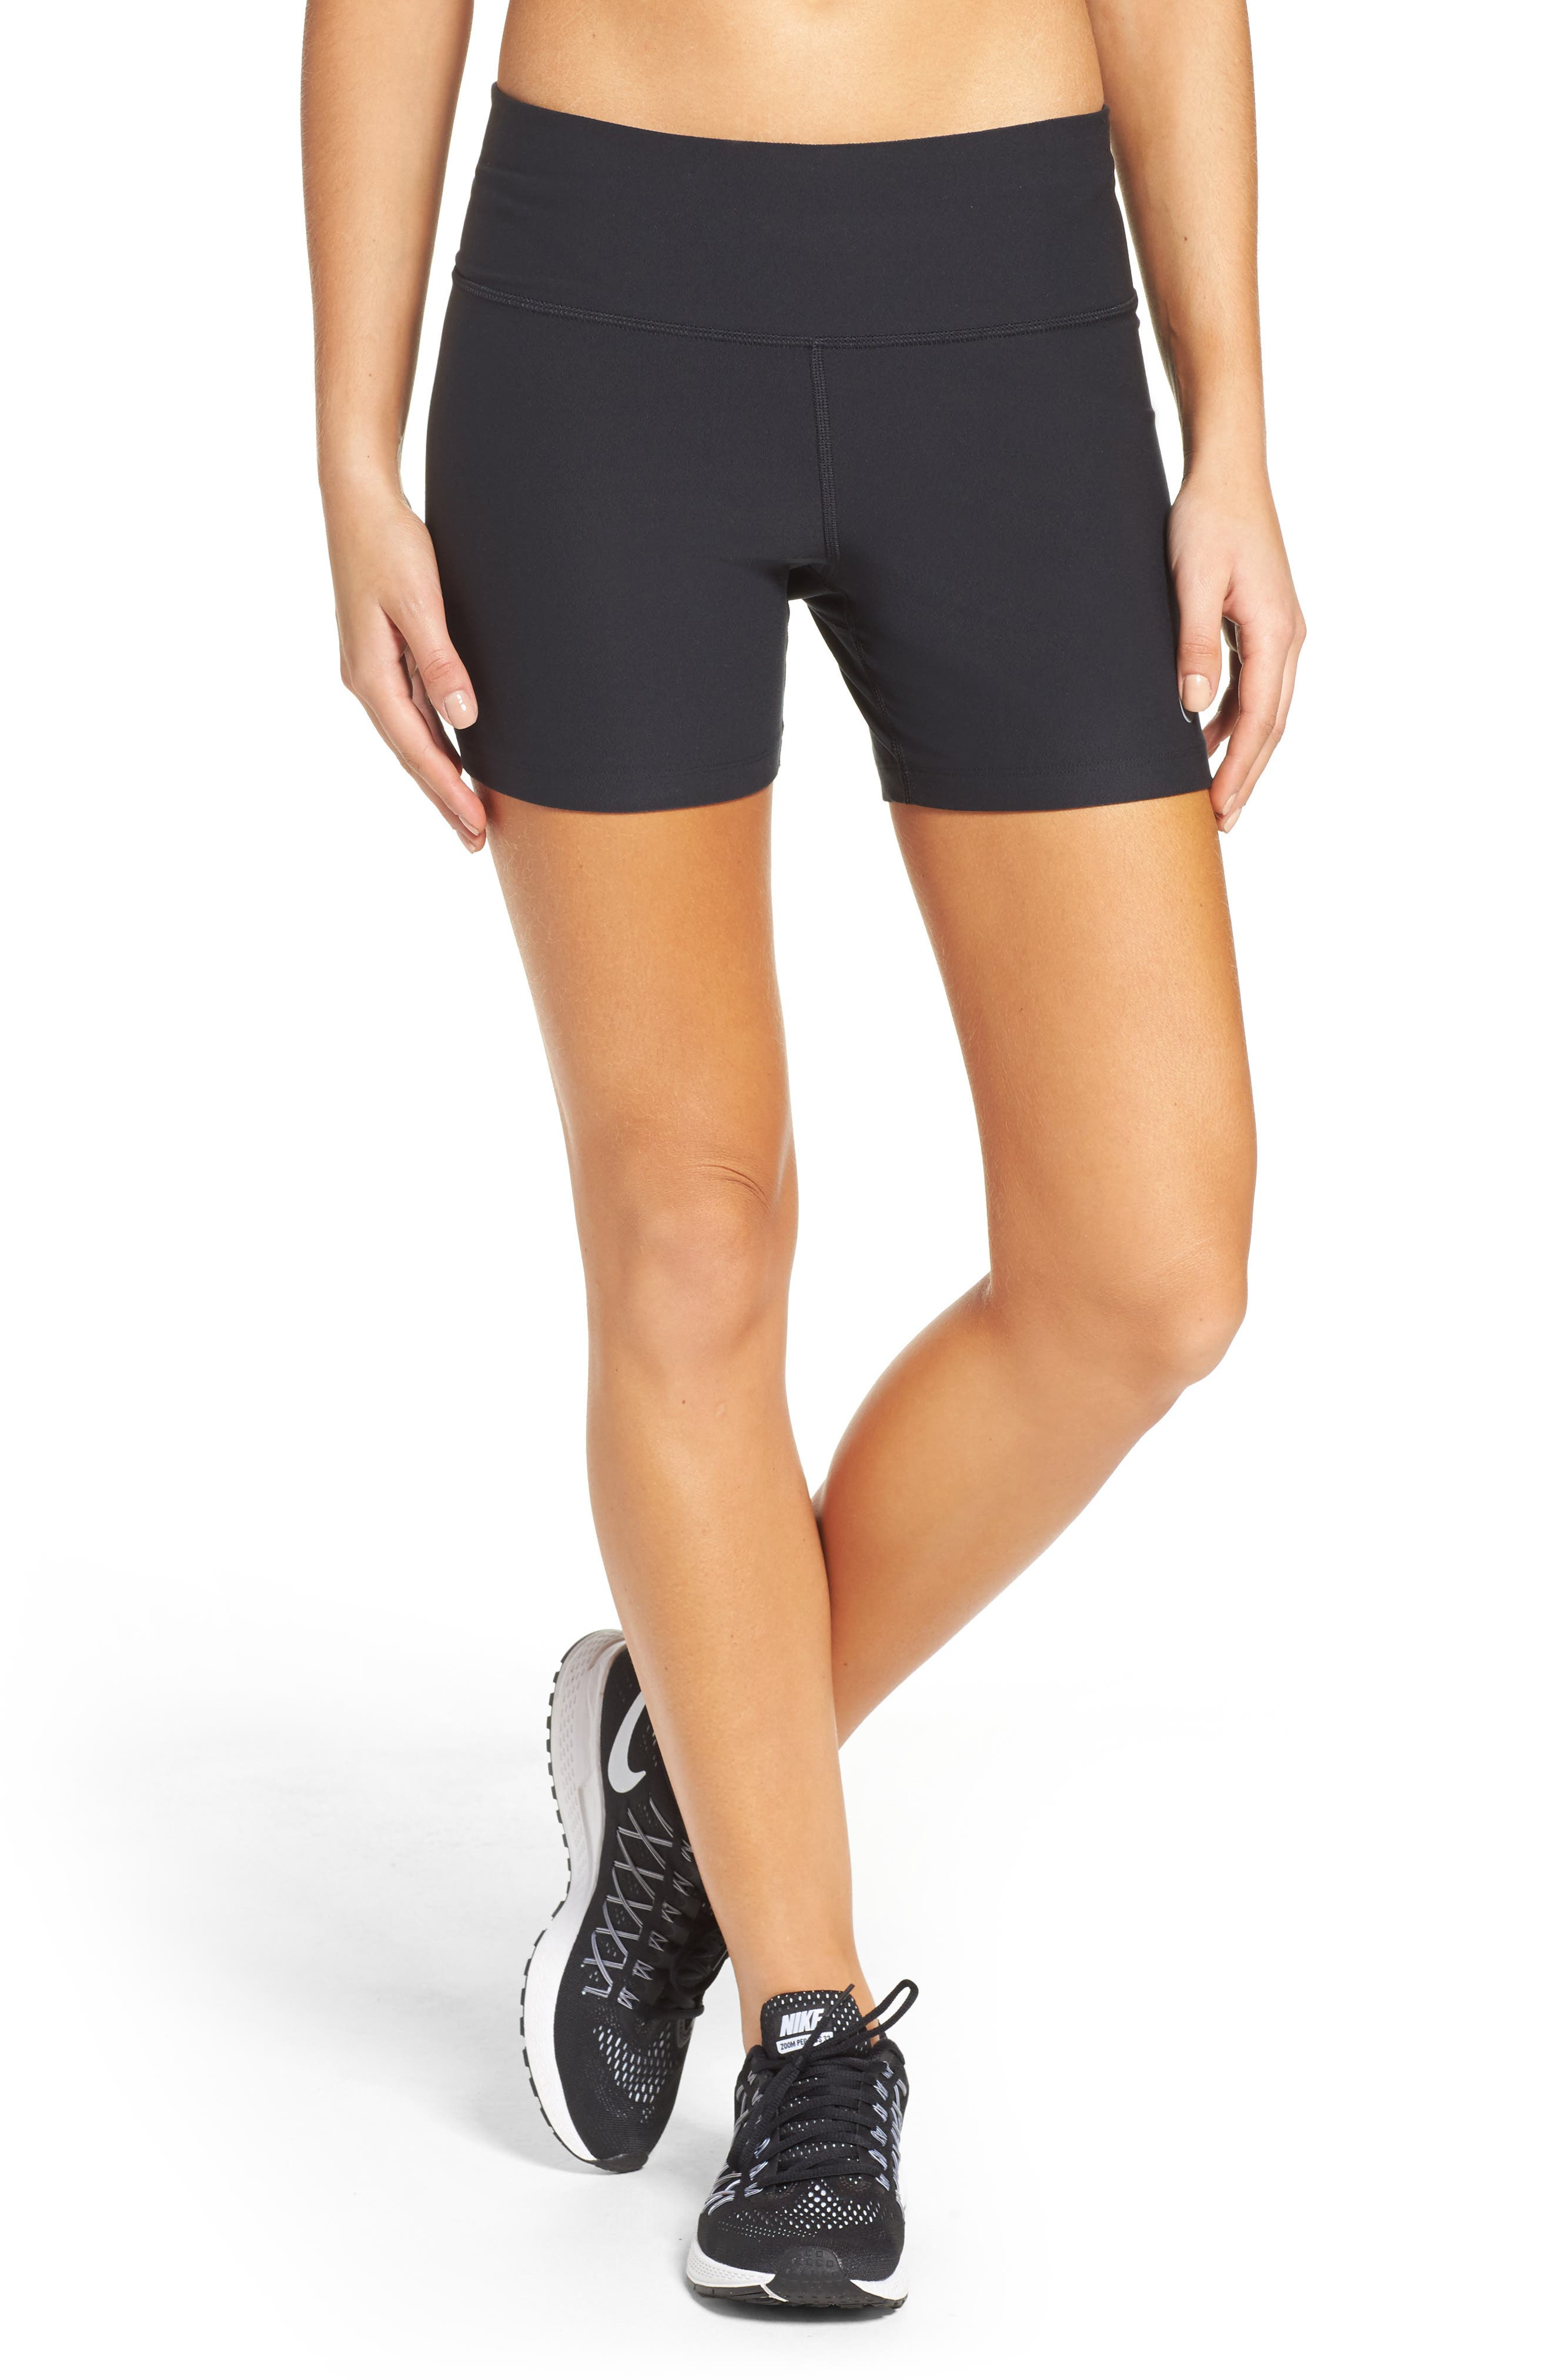 Power Shorts,                         Main,                         color, 010